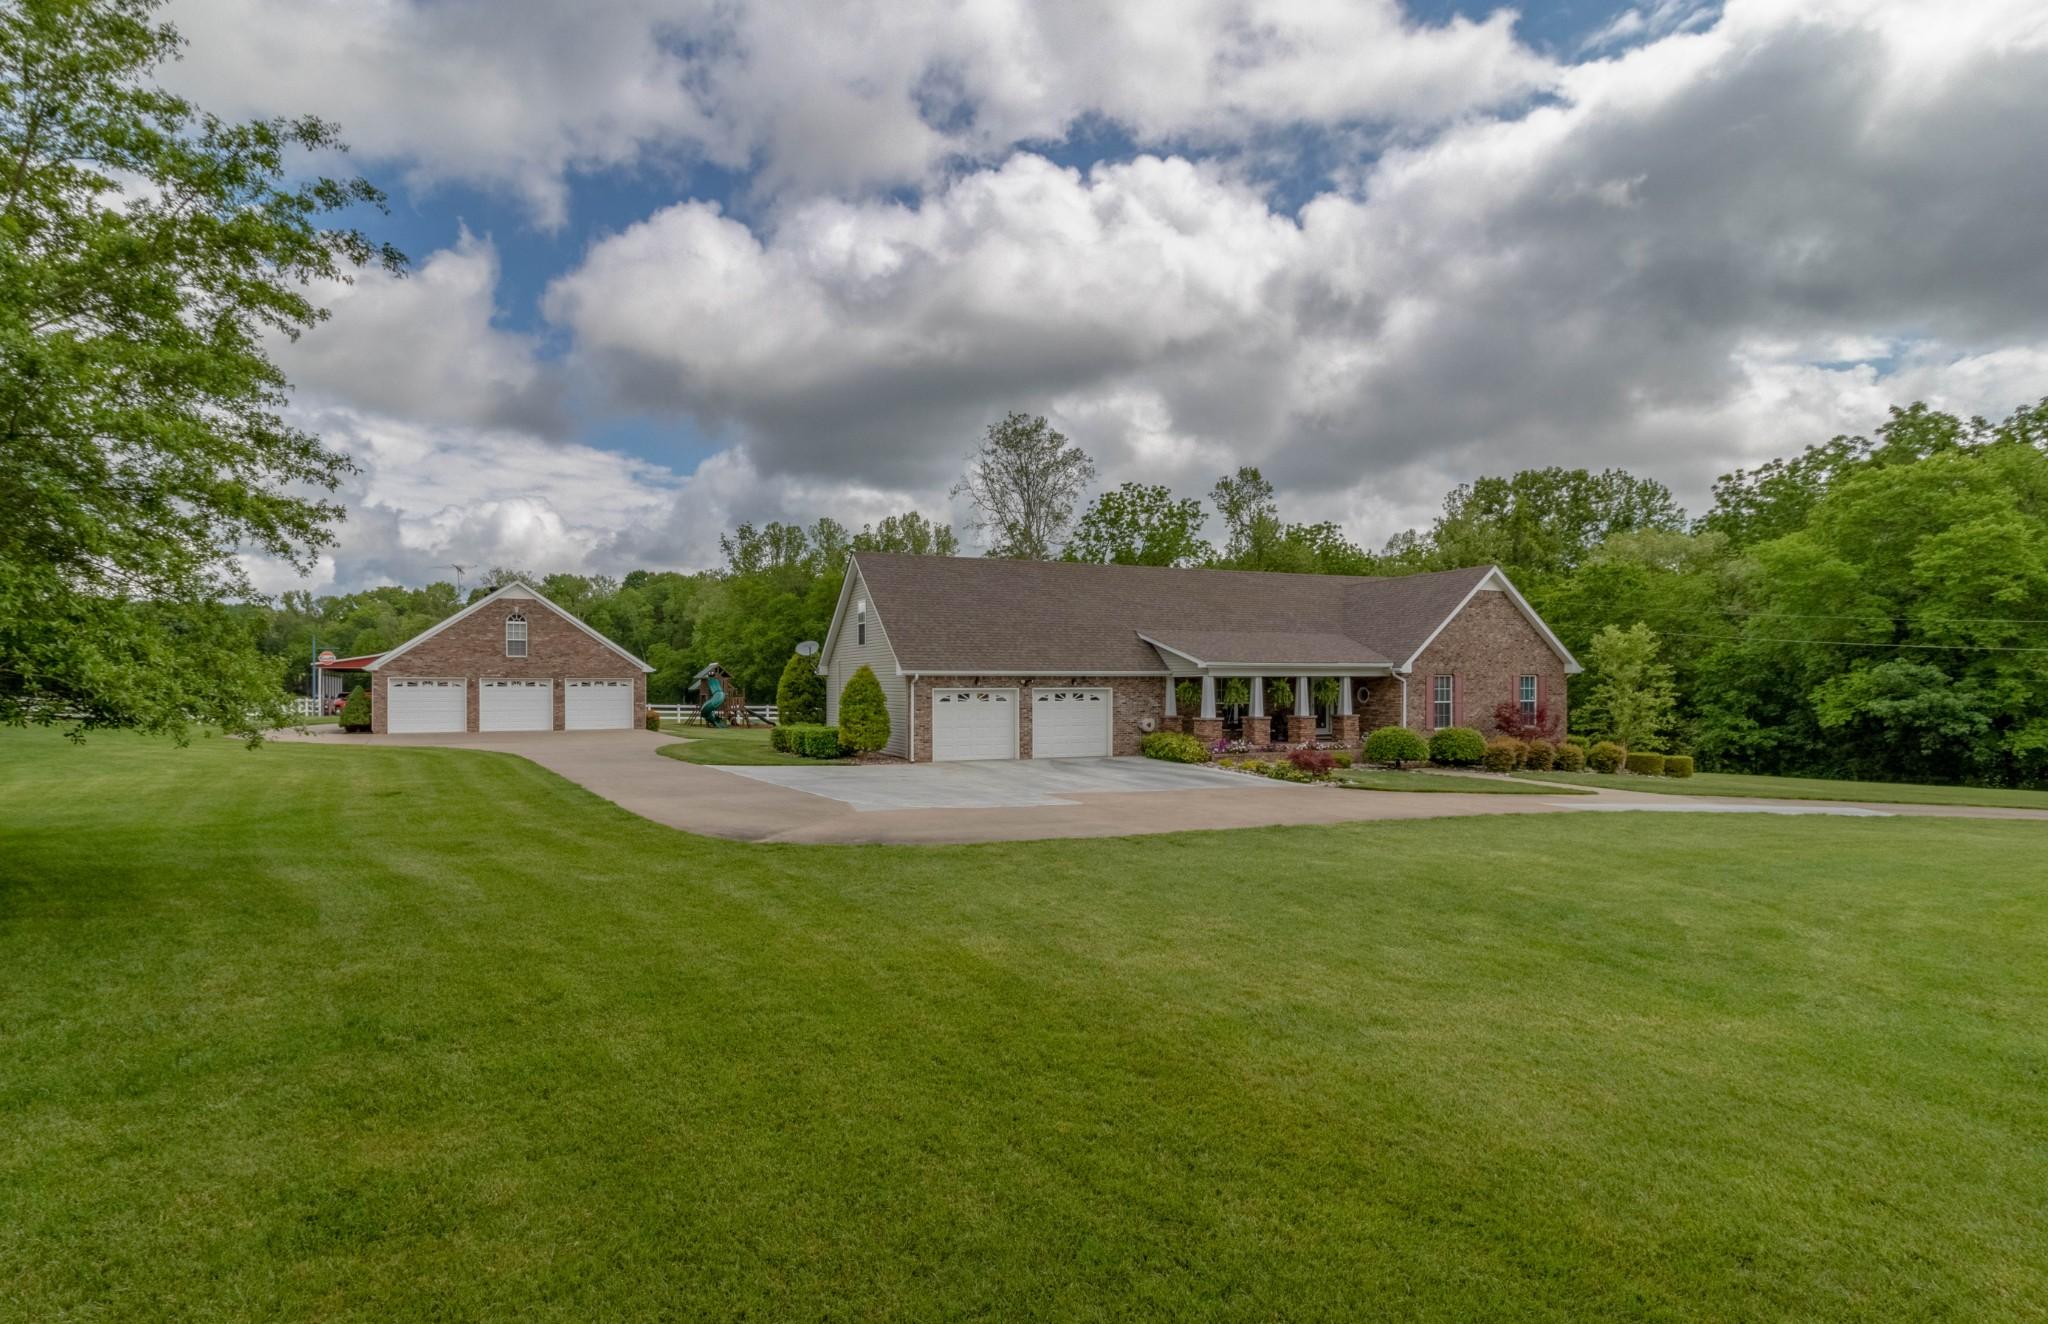 730 Indian Creek Rd, Cumberland Furnace, TN 37051 - Cumberland Furnace, TN real estate listing